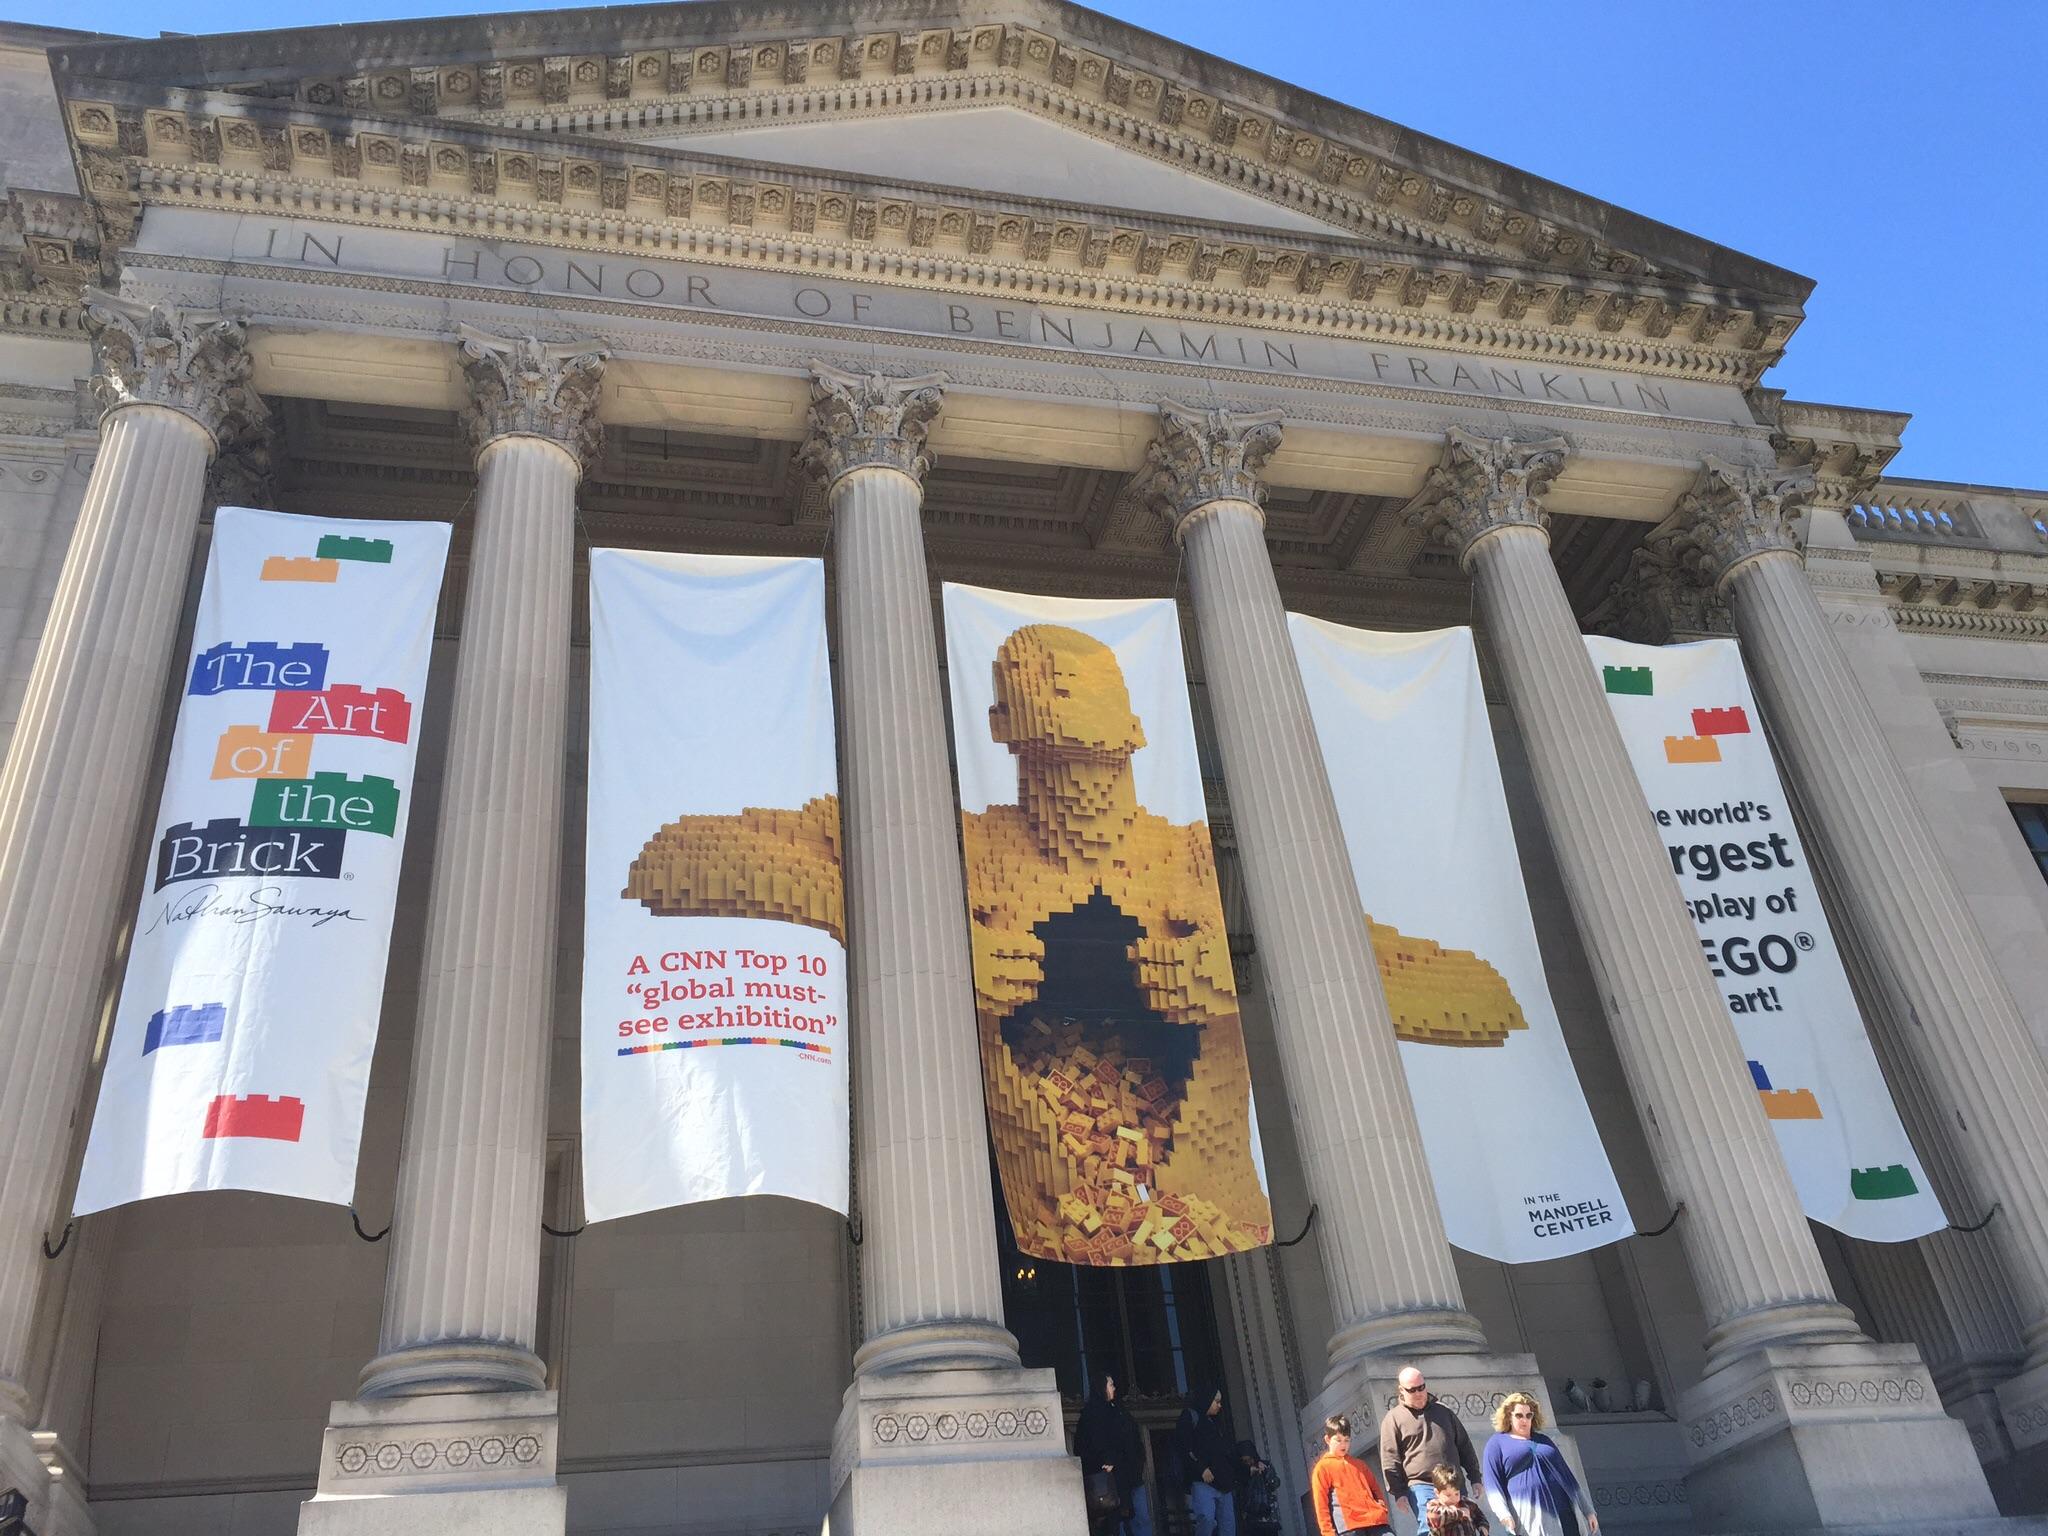 """Art of the Brick"" Exhibit at the Franklin Institute in Philadelphia, PA"